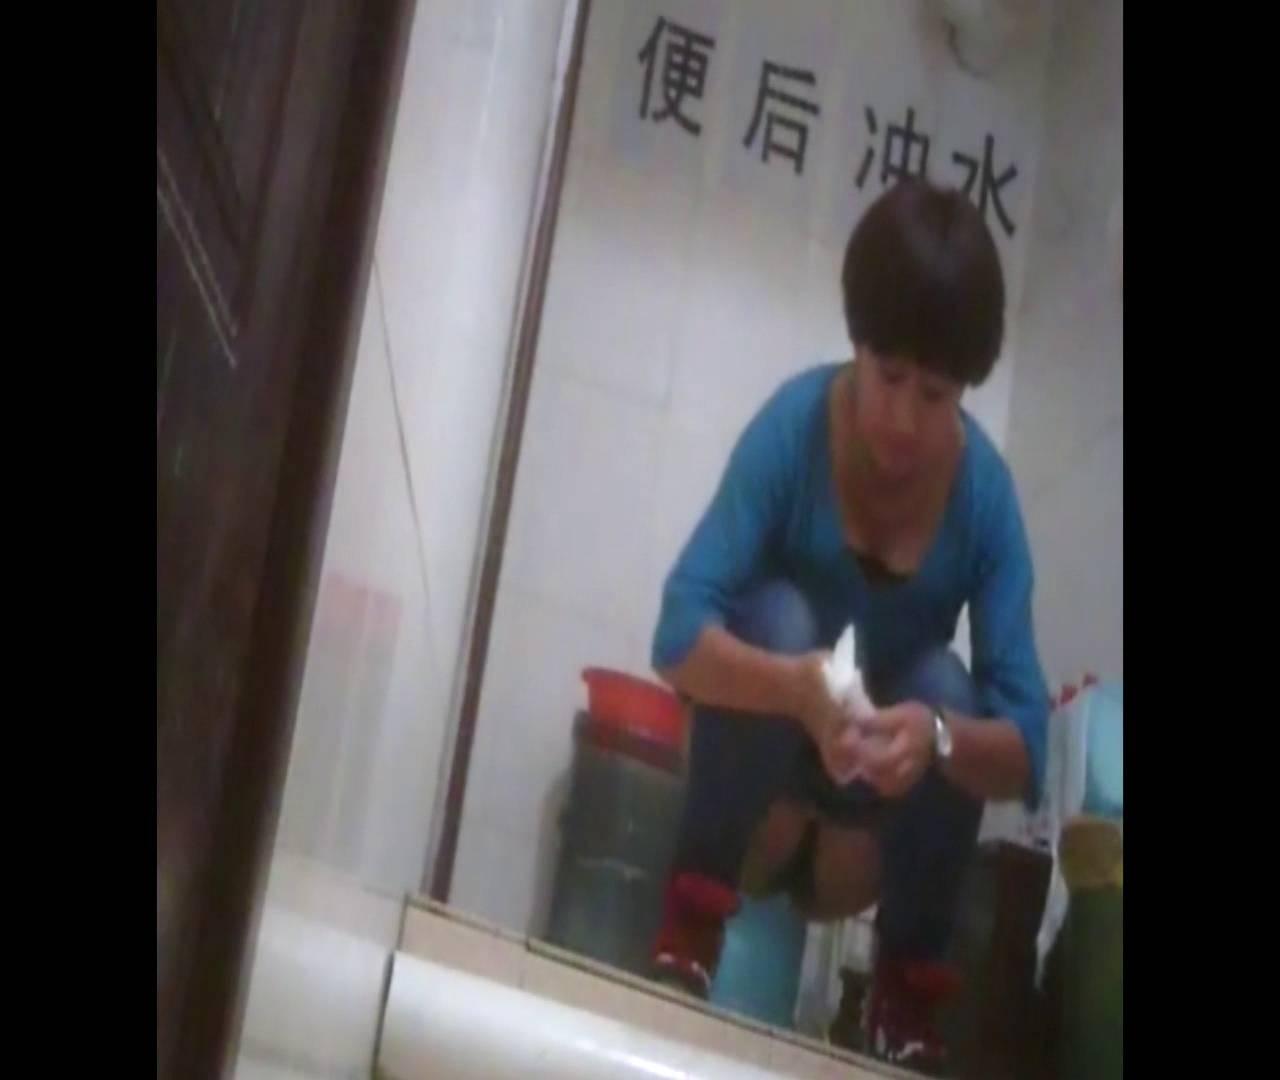 Vol.37 豊満な胸を持つマッシュルームカットな彼女 洗面所 | 丸見え  63画像 7